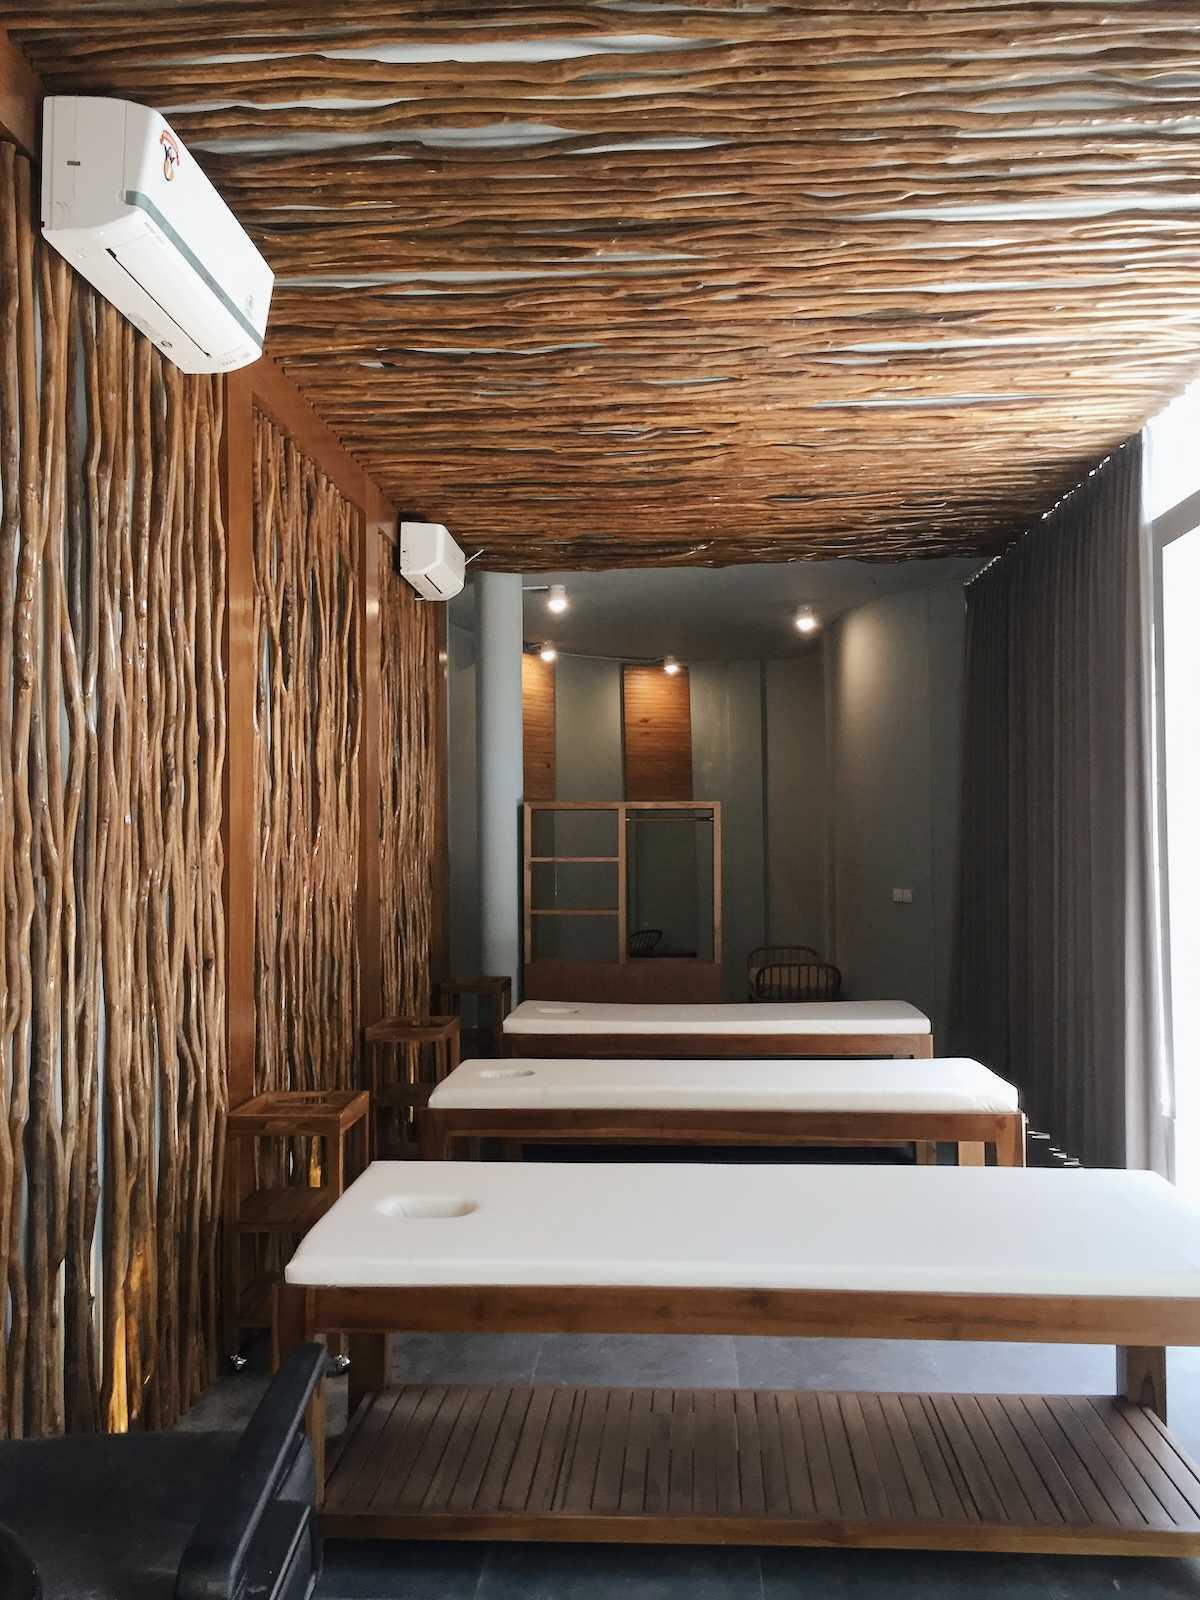 Sume Interior Taman Air Spa Jl. Sunset Road No.88, Kuta, Kabupaten Badung, Bali 80361, Indonesia Jl. Sunset Road No.88, Kuta, Kabupaten Badung, Bali 80361, Indonesia Sume-Interior-Taman-Air-Spa-Treatment-Room  101120